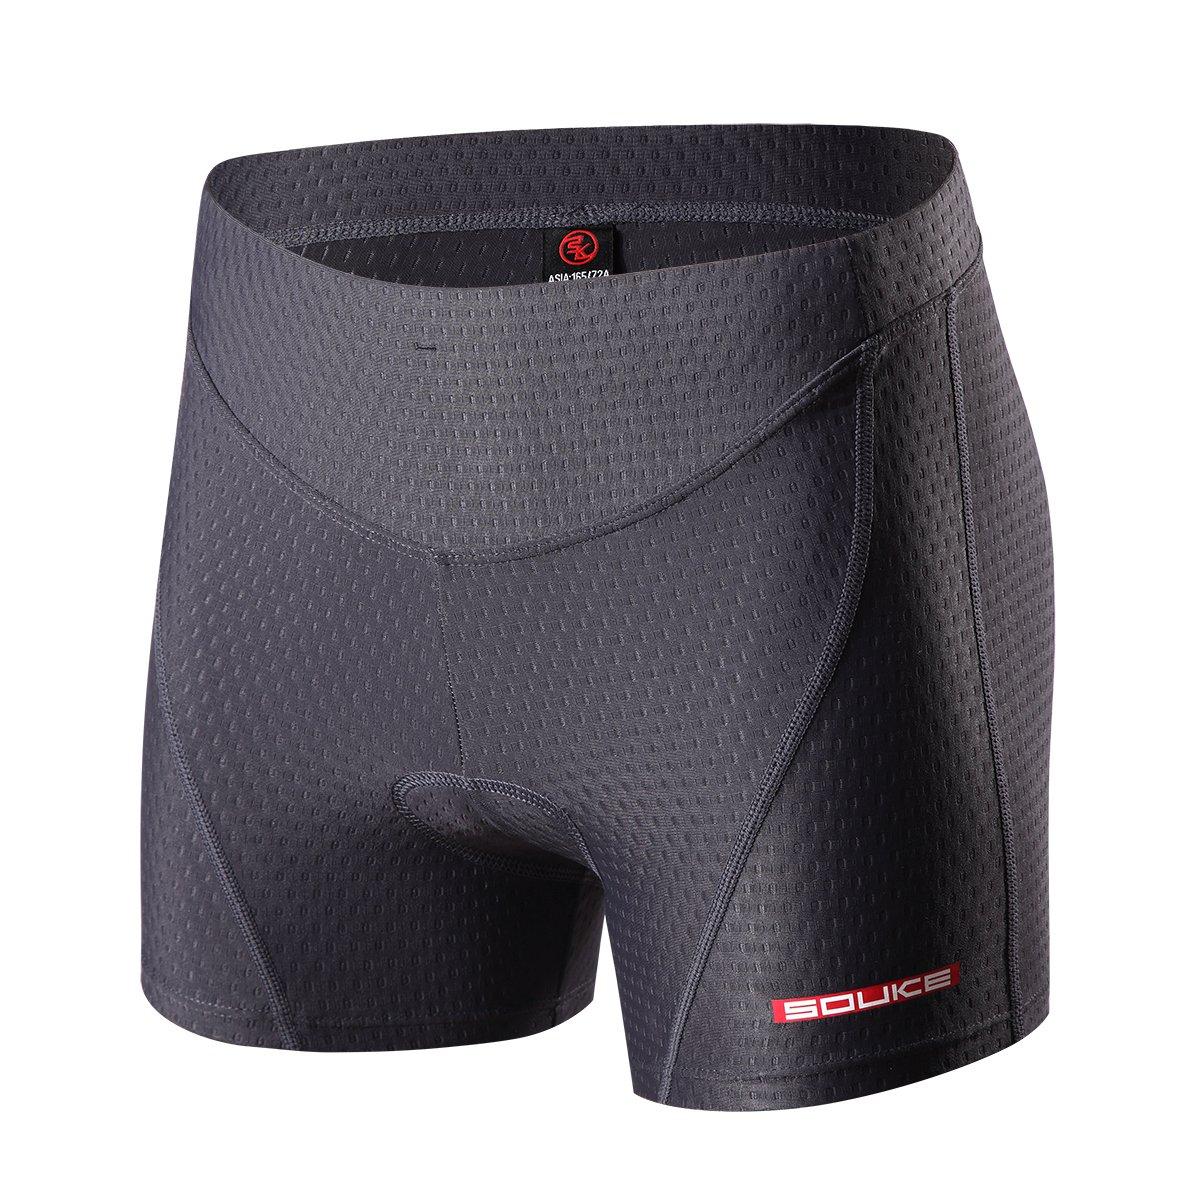 Eco-daily Cycling Shorts Women's 3D Padded Bicycle Bike Biking Underwear Shorts